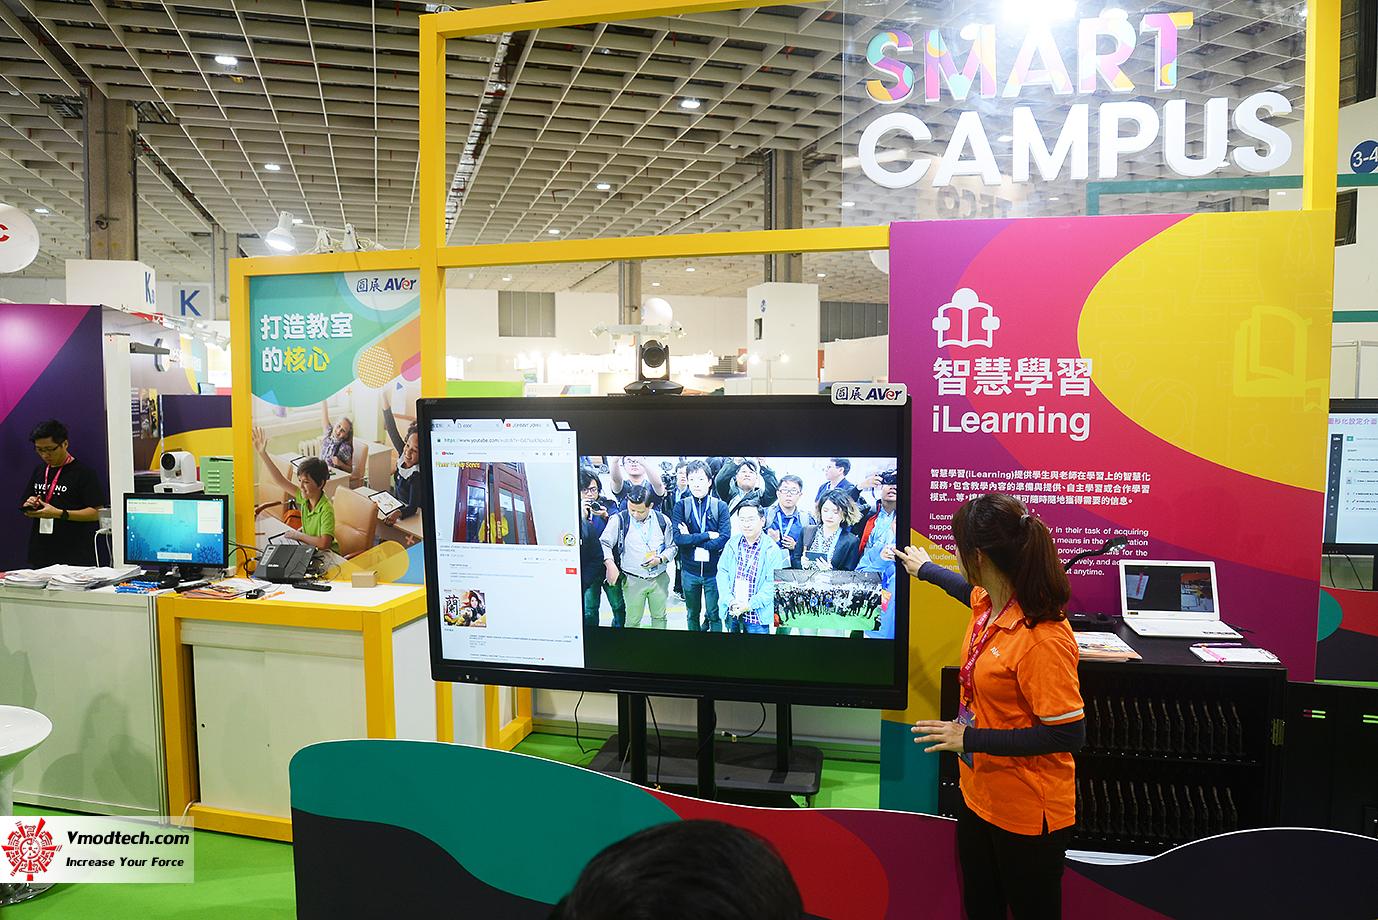 dsc 8400 เยี่ยมชมบูธ Smart Education ระบบการศึกษาอัจฉริยะในงาน 2019 SMART CITY SUMMIT & EXPO ณ กรุงไทเป ประเทศไต้หวัน